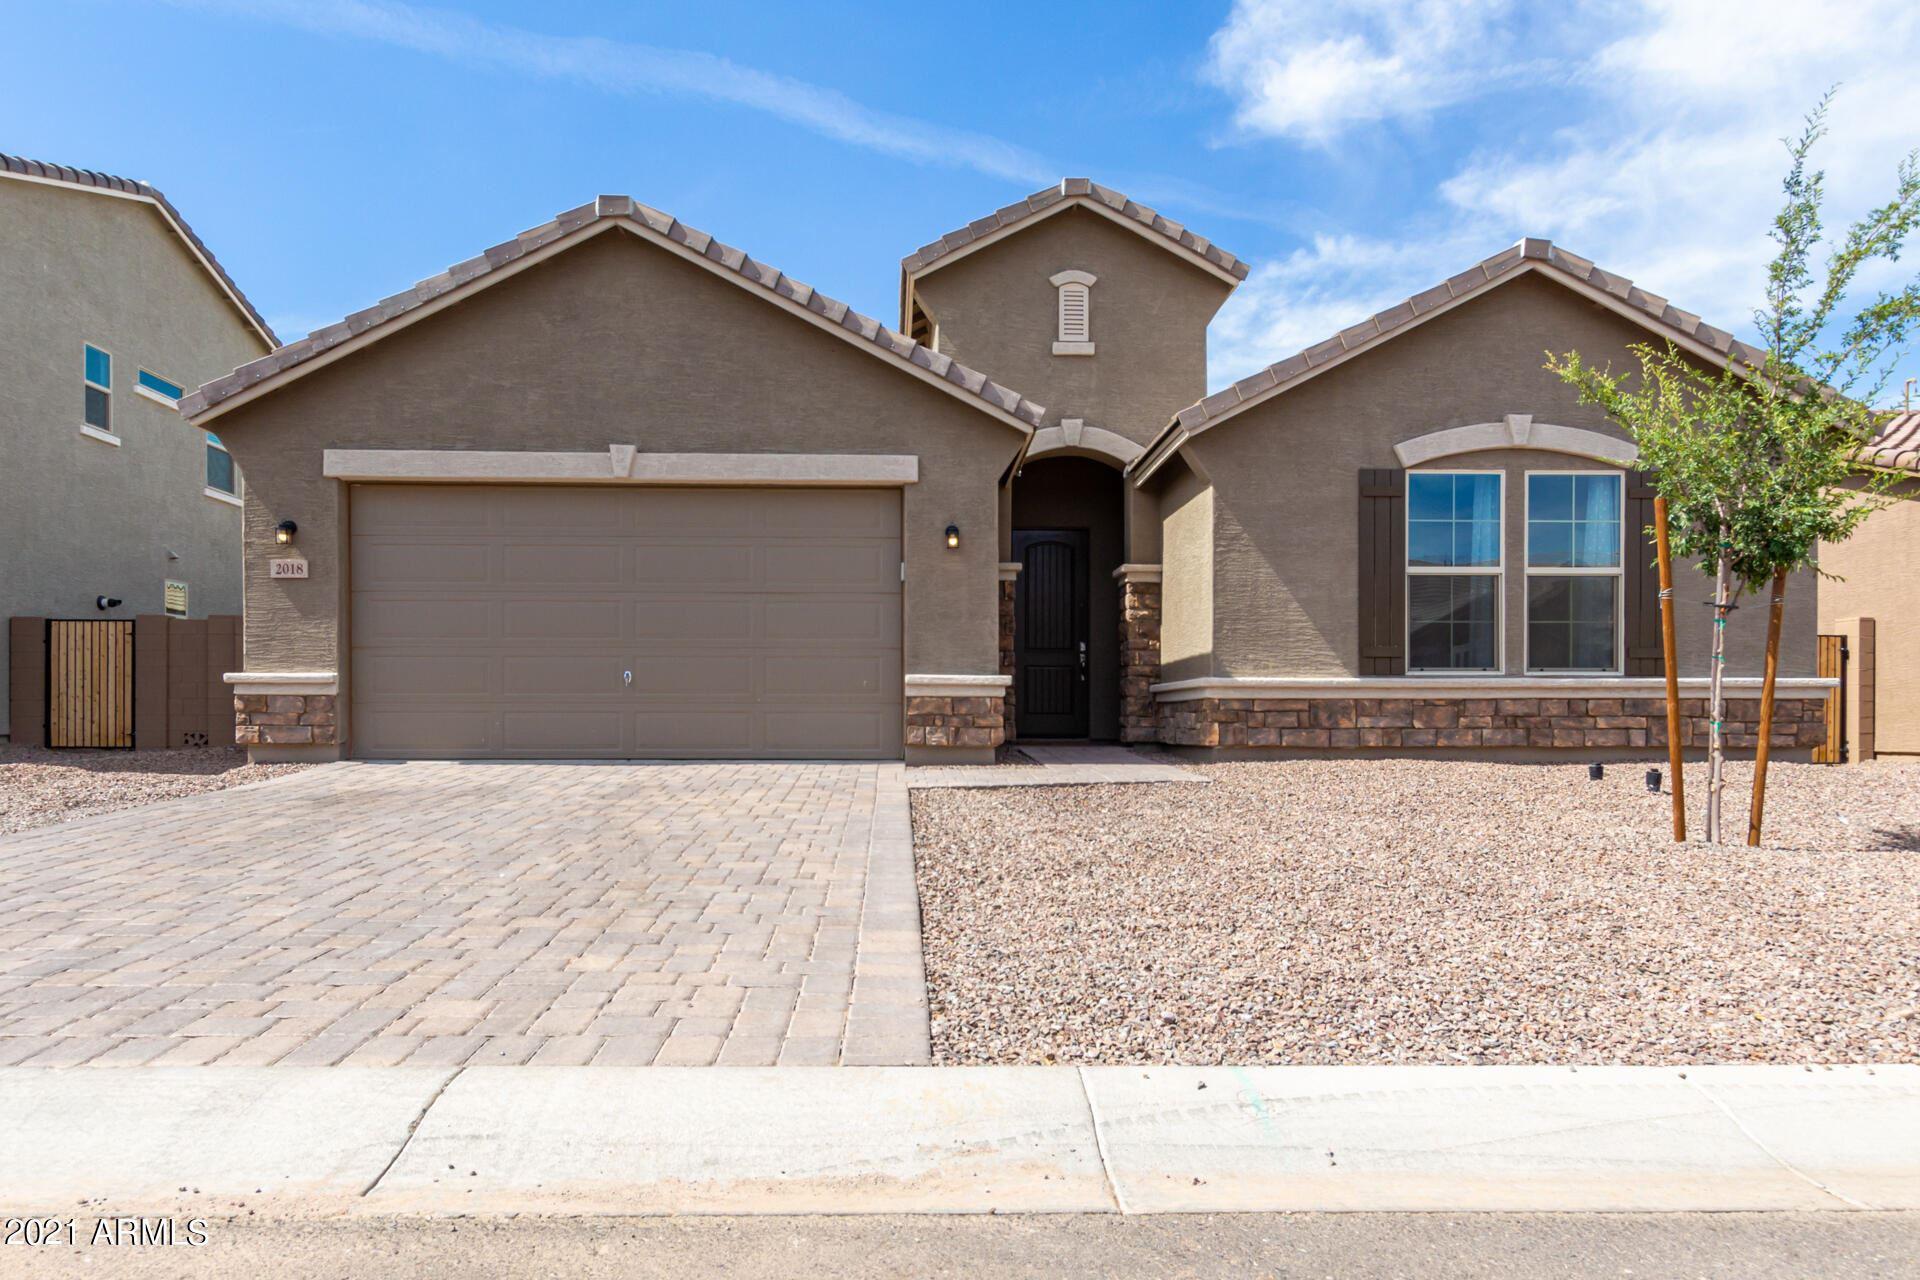 Photo of 2018 W MADISEN MARIE Avenue, Queen Creek, AZ 85142 (MLS # 6249032)